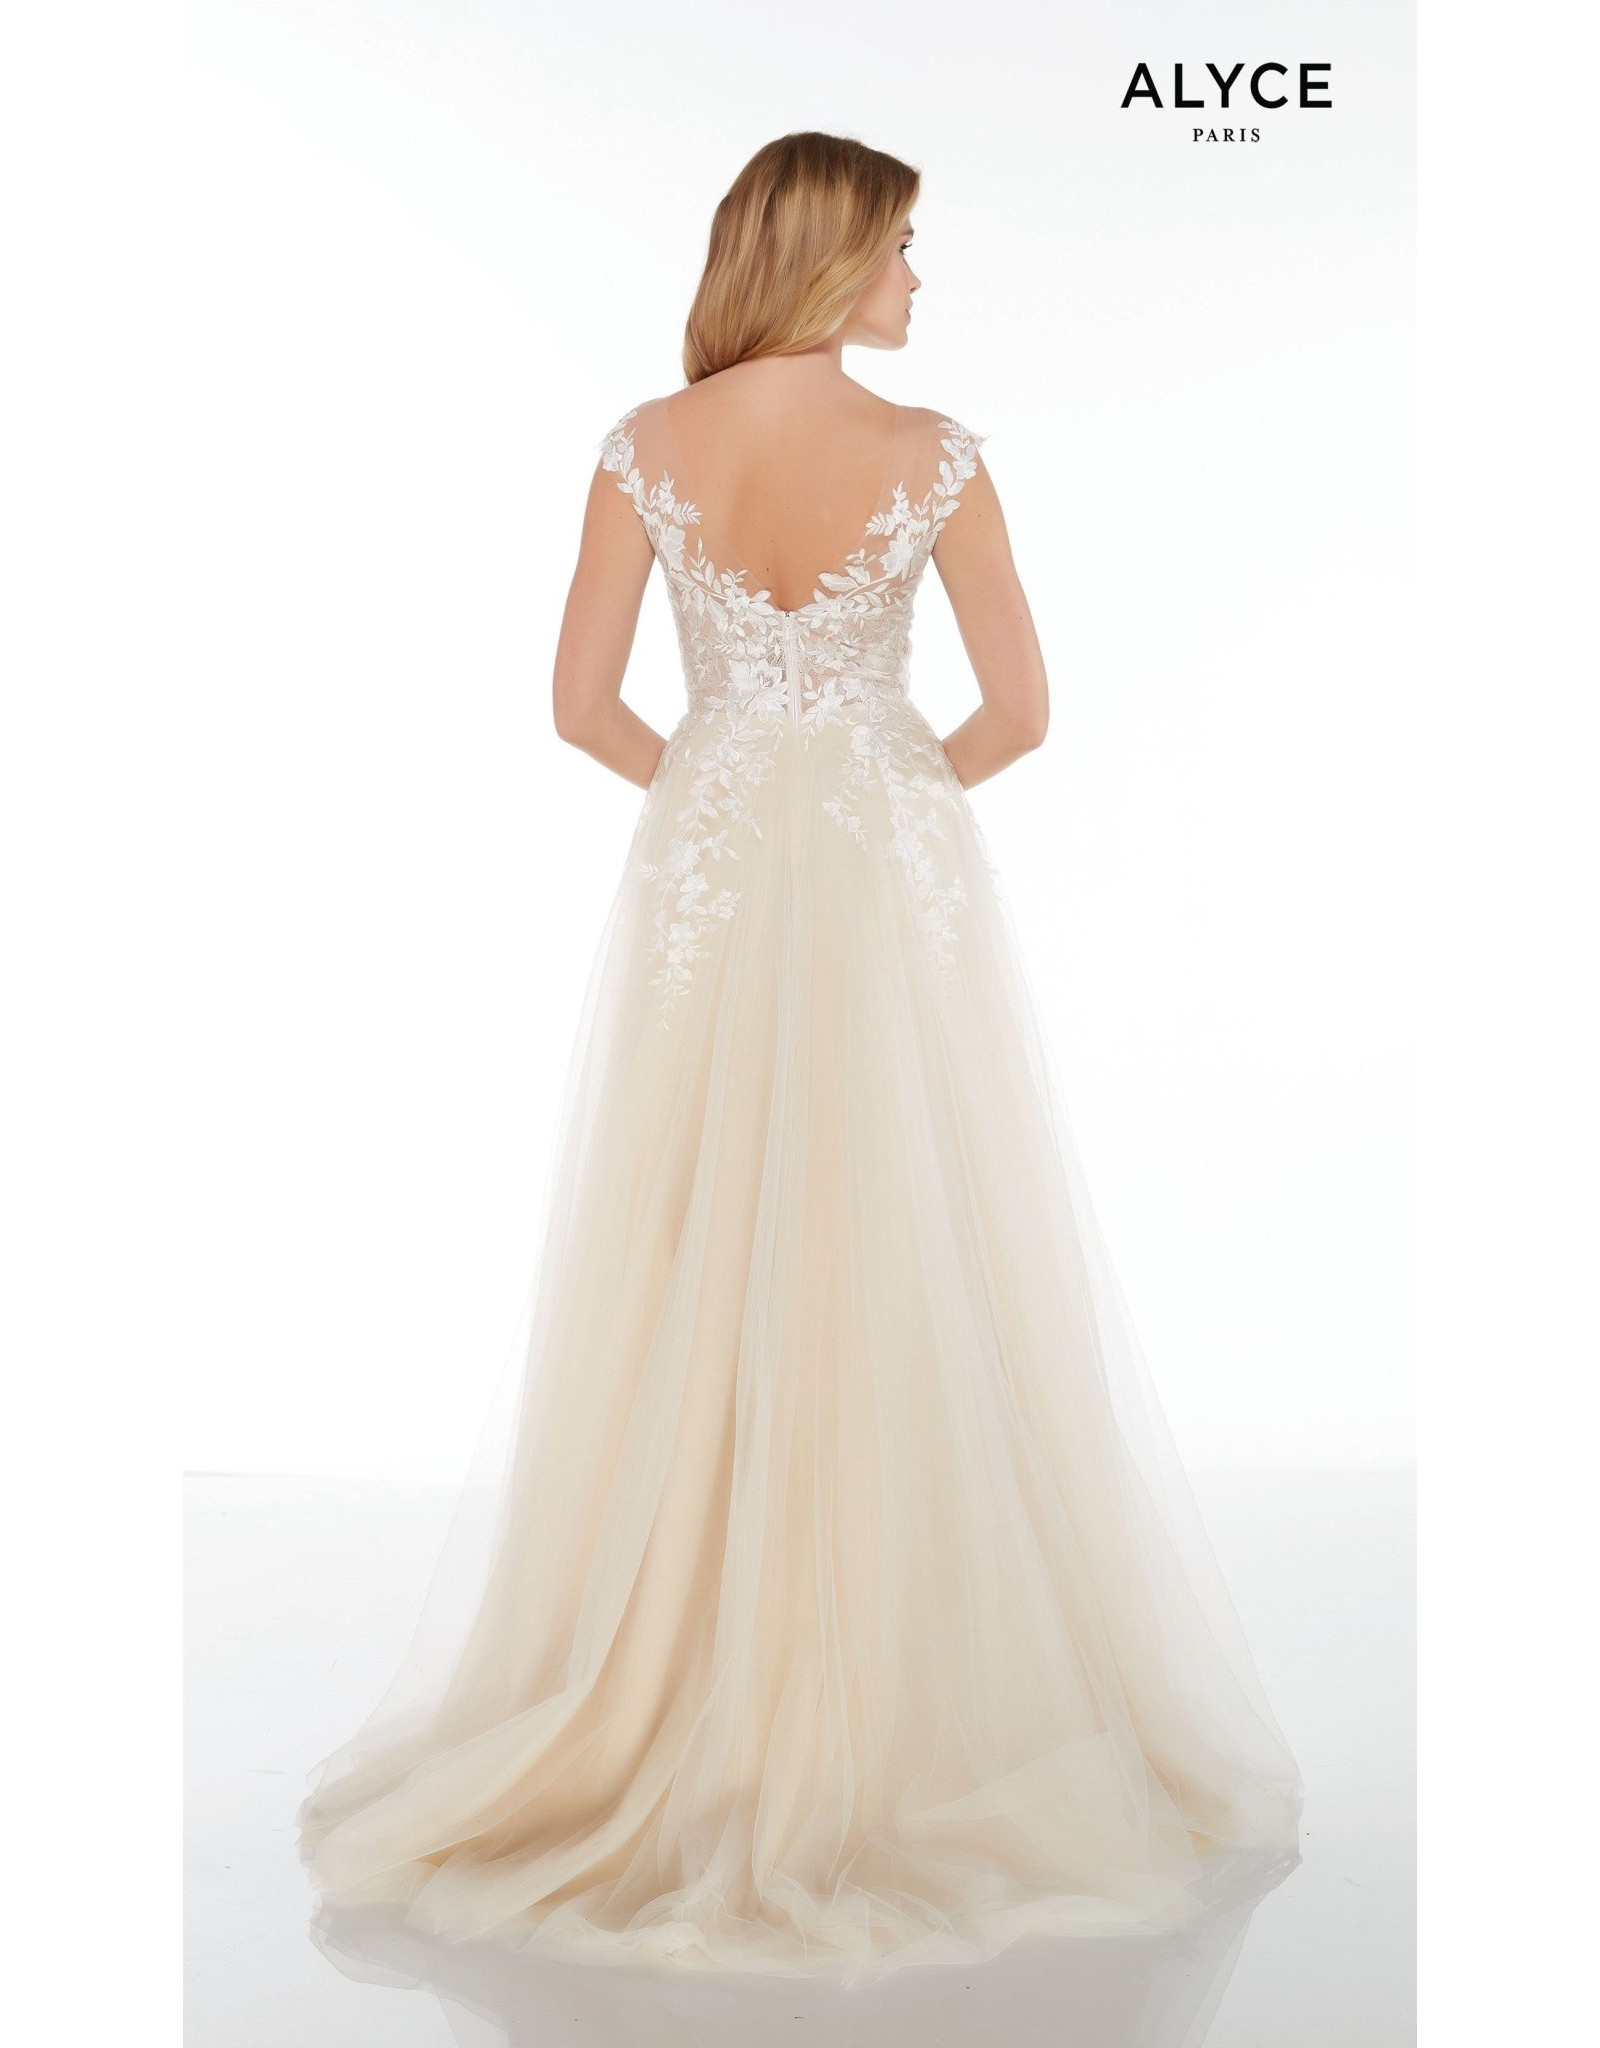 Alyce 5090 Alyce Dresses